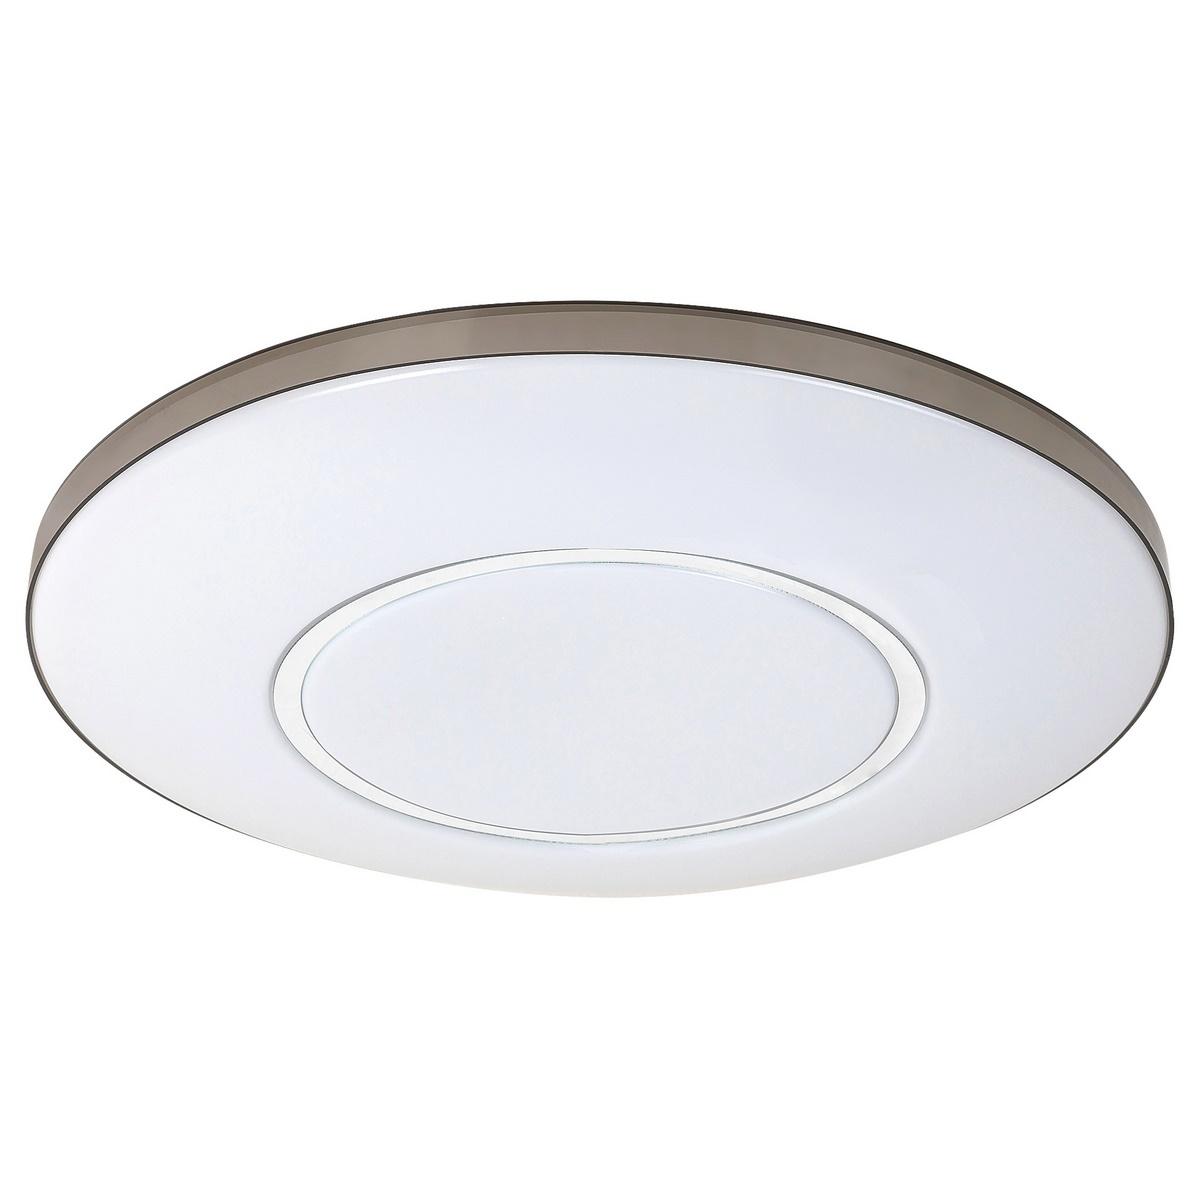 Rabalux 5695 Elbert Stropní LED svítidlo bílá, pr. 40,5 cm